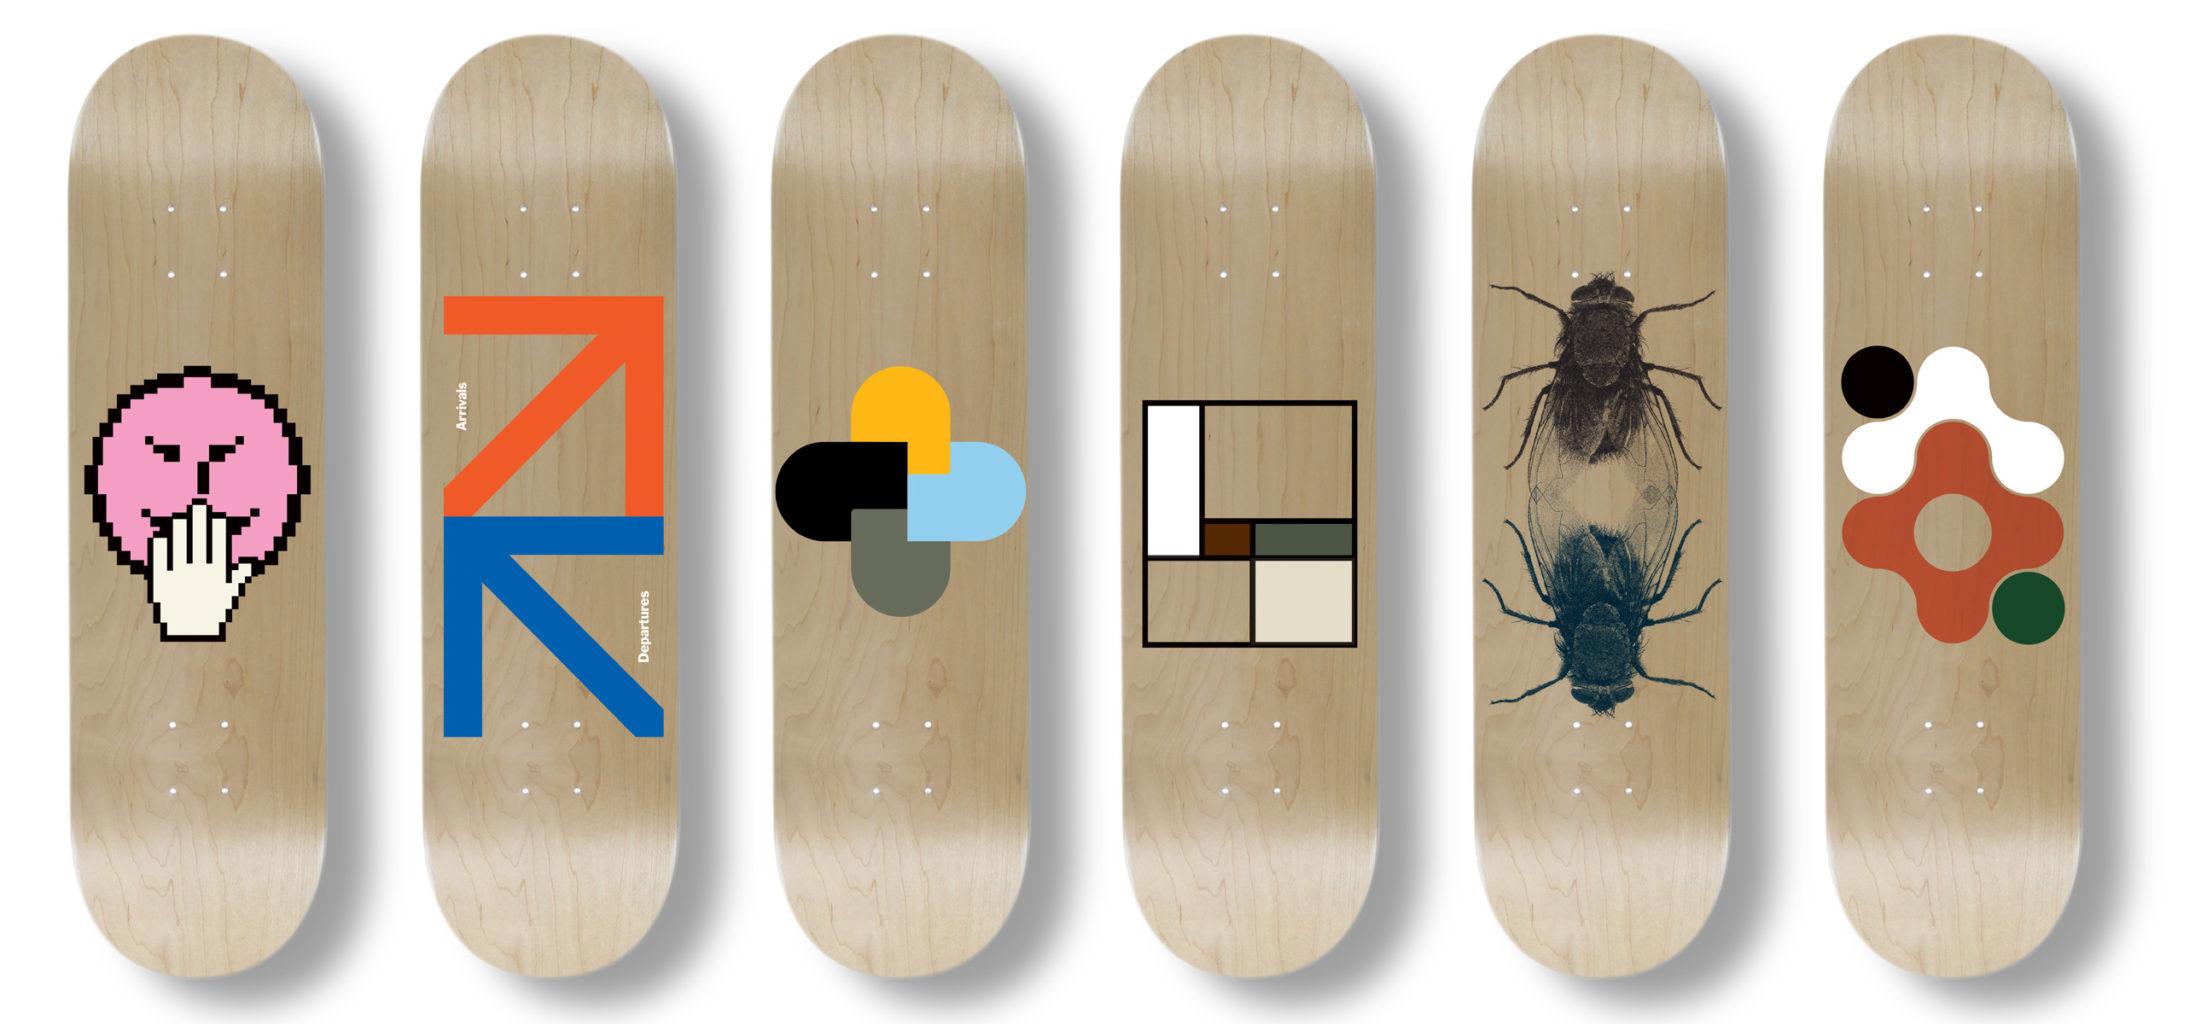 CustomSkateDeck - Custom Skate Decks